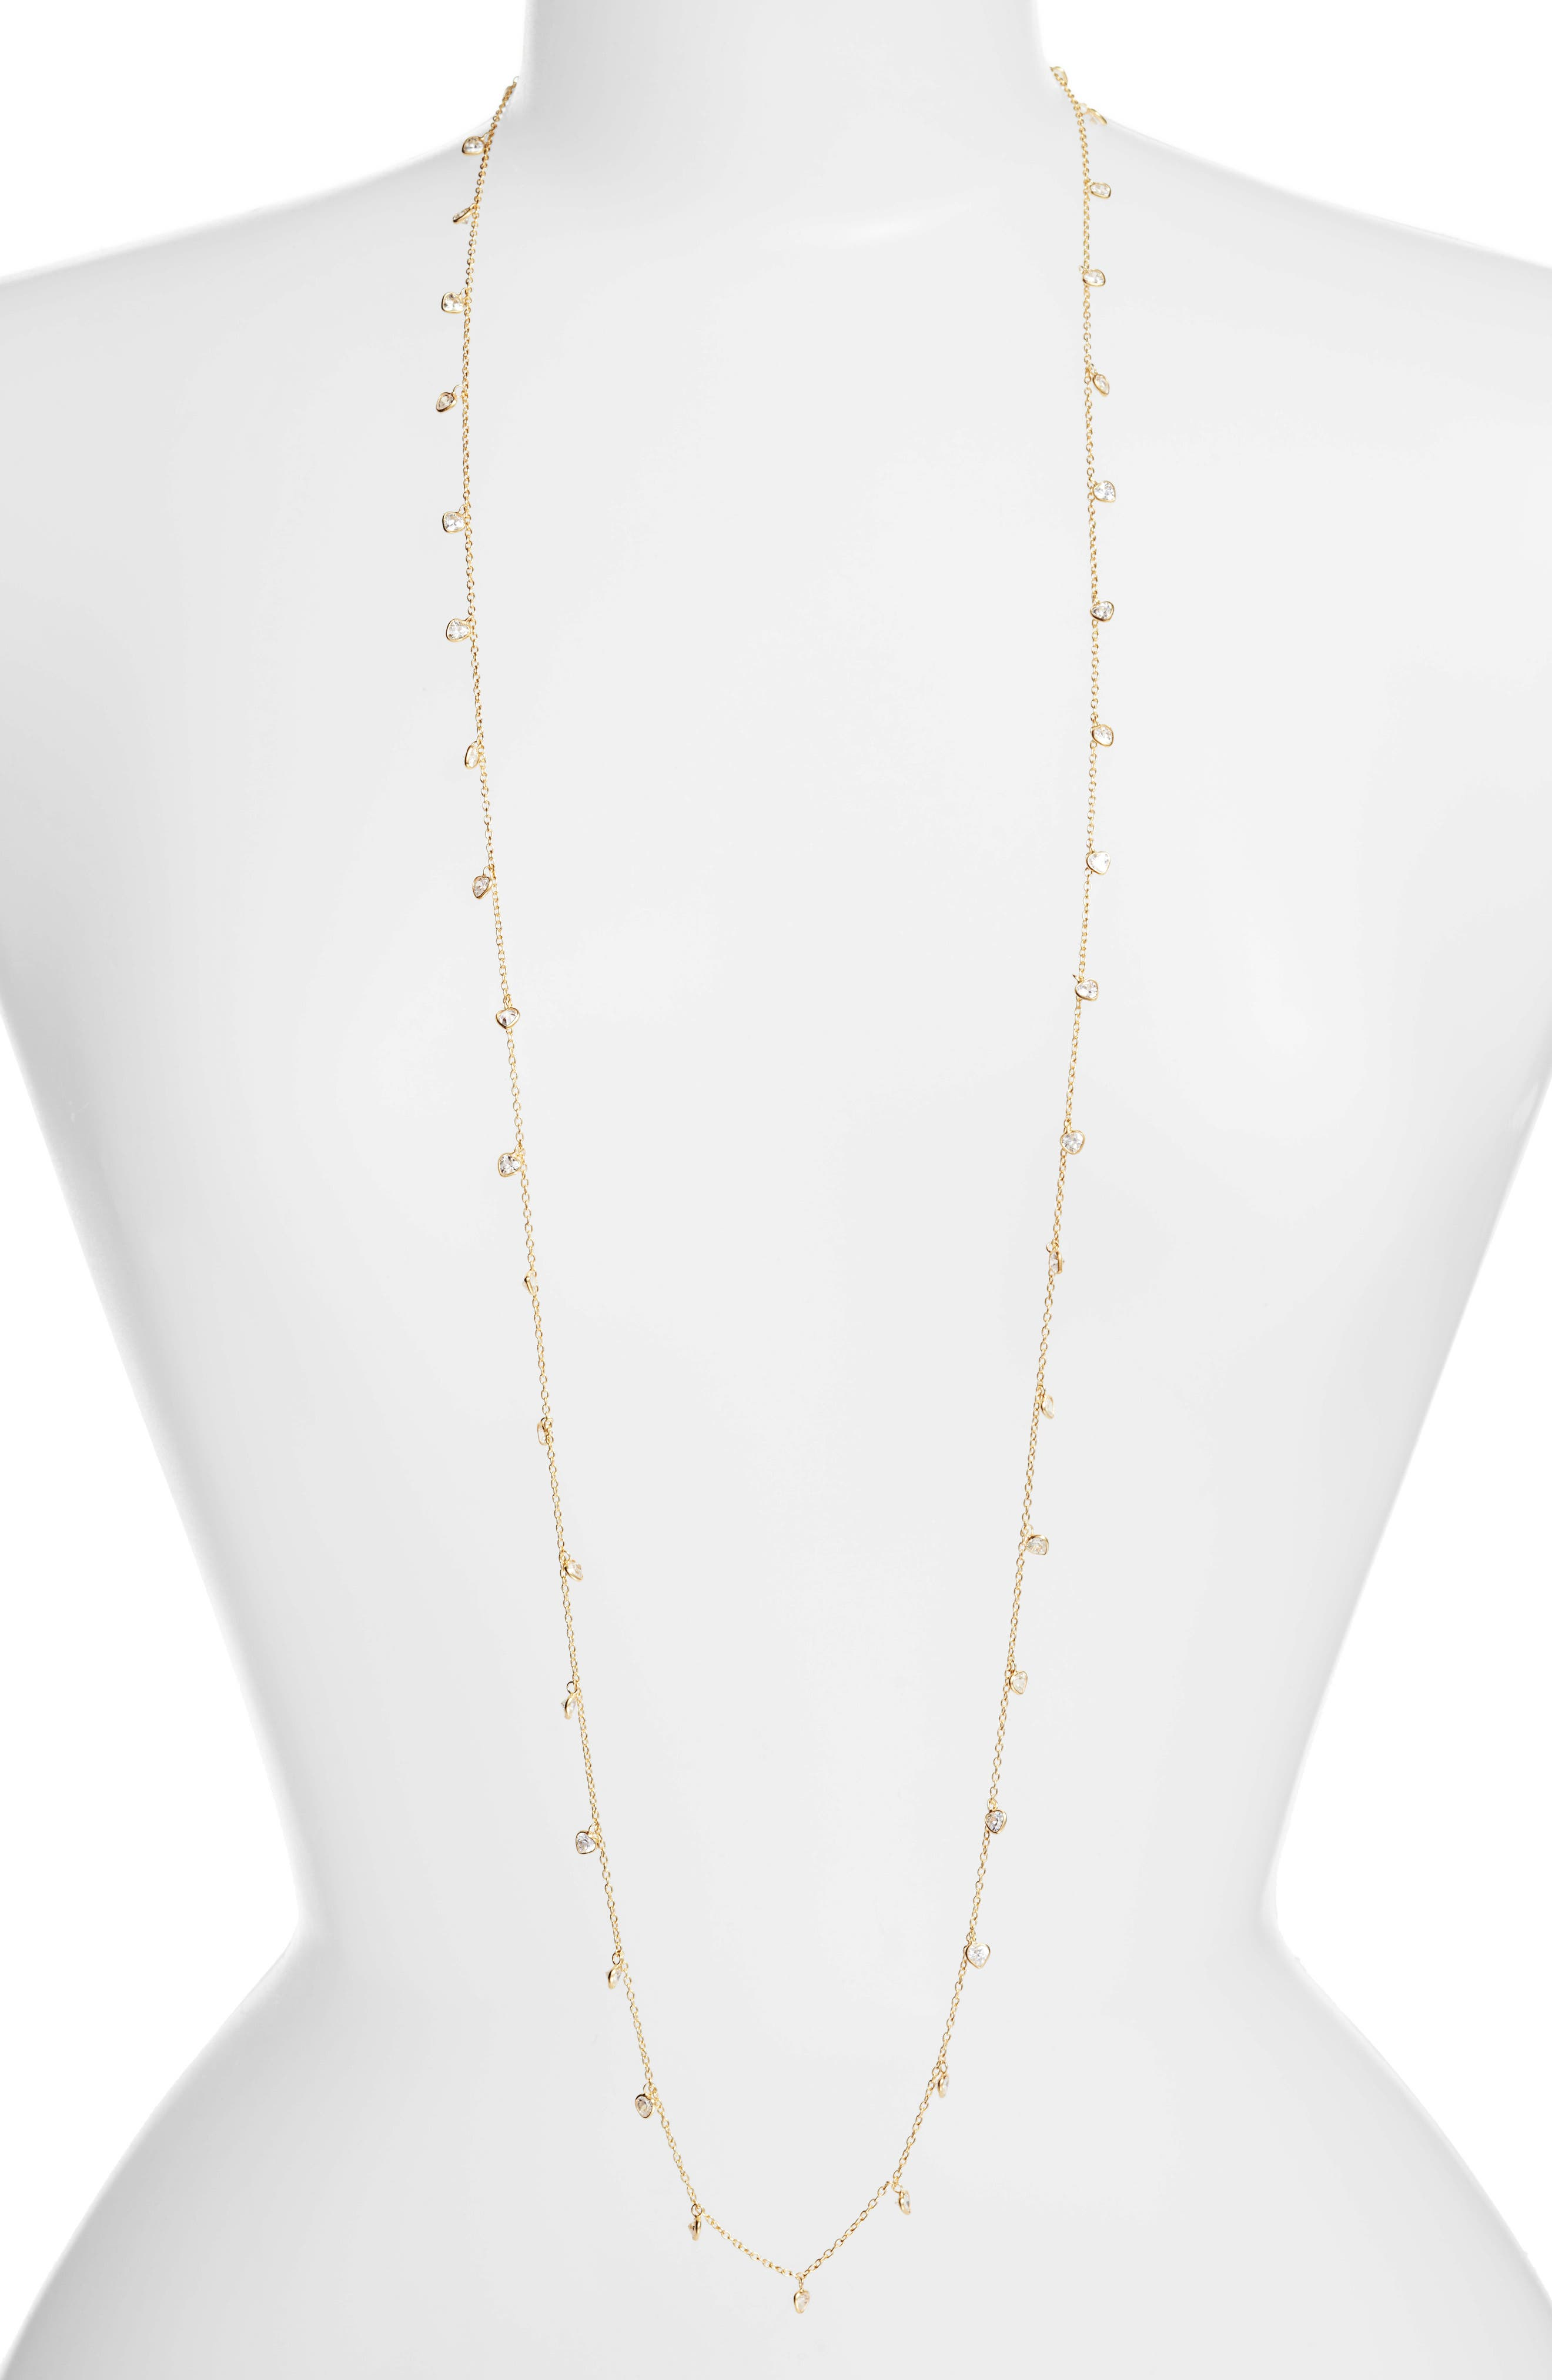 Diana Cubic Zirconia Necklace,                             Main thumbnail 1, color,                             Gold